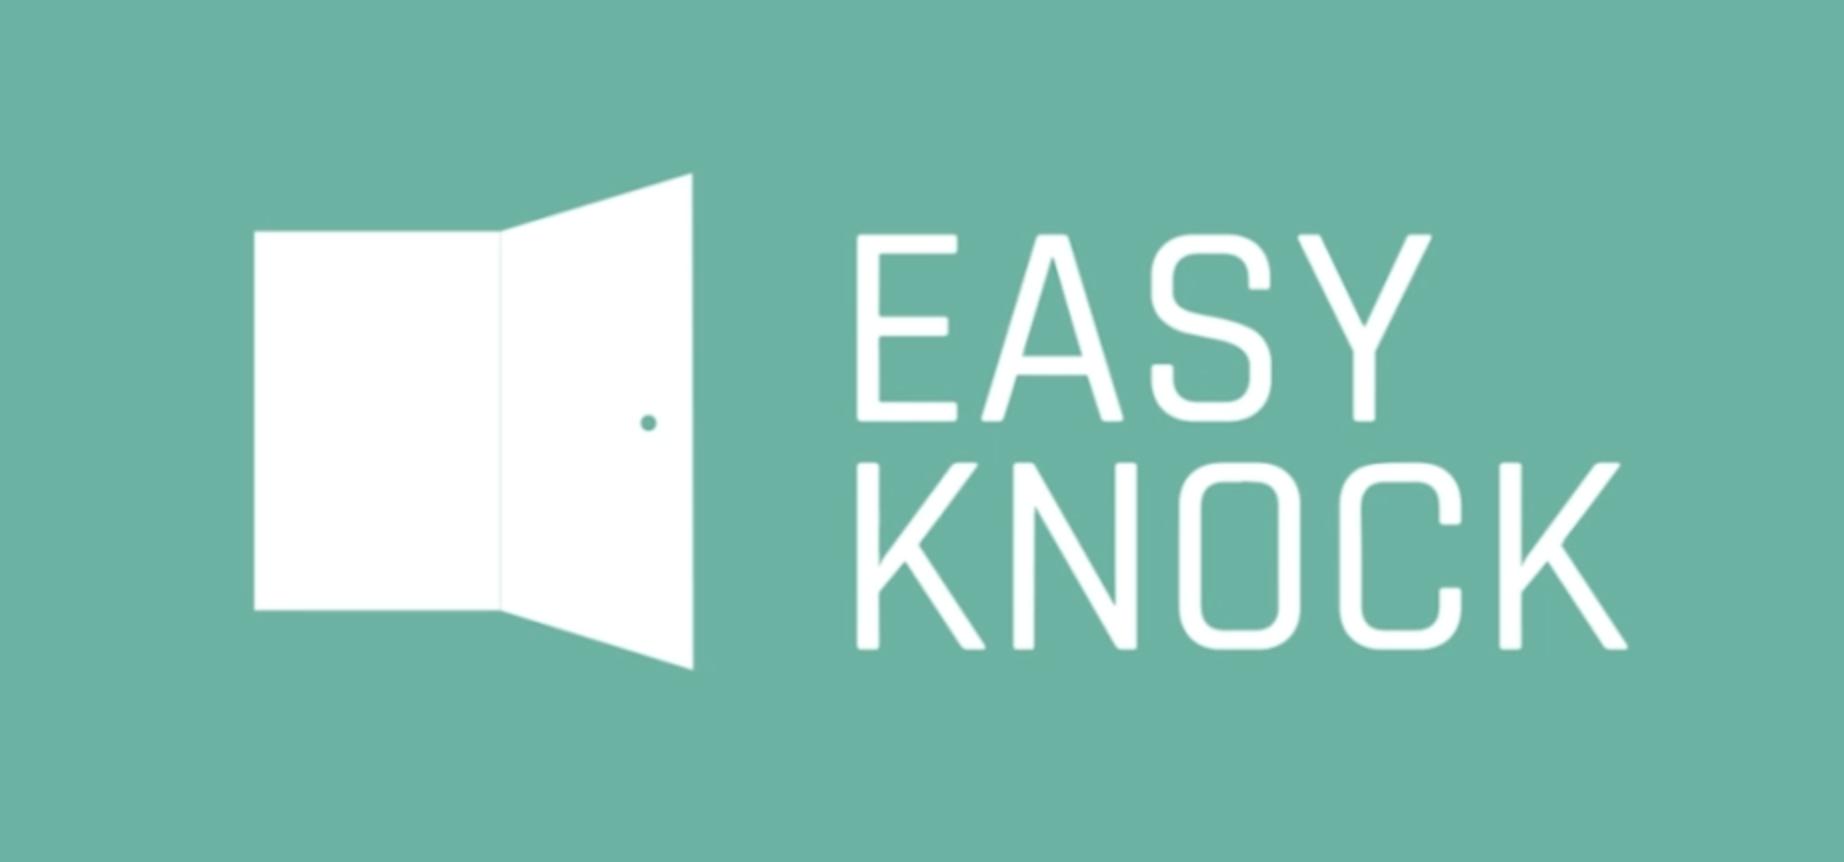 Easyknock.png